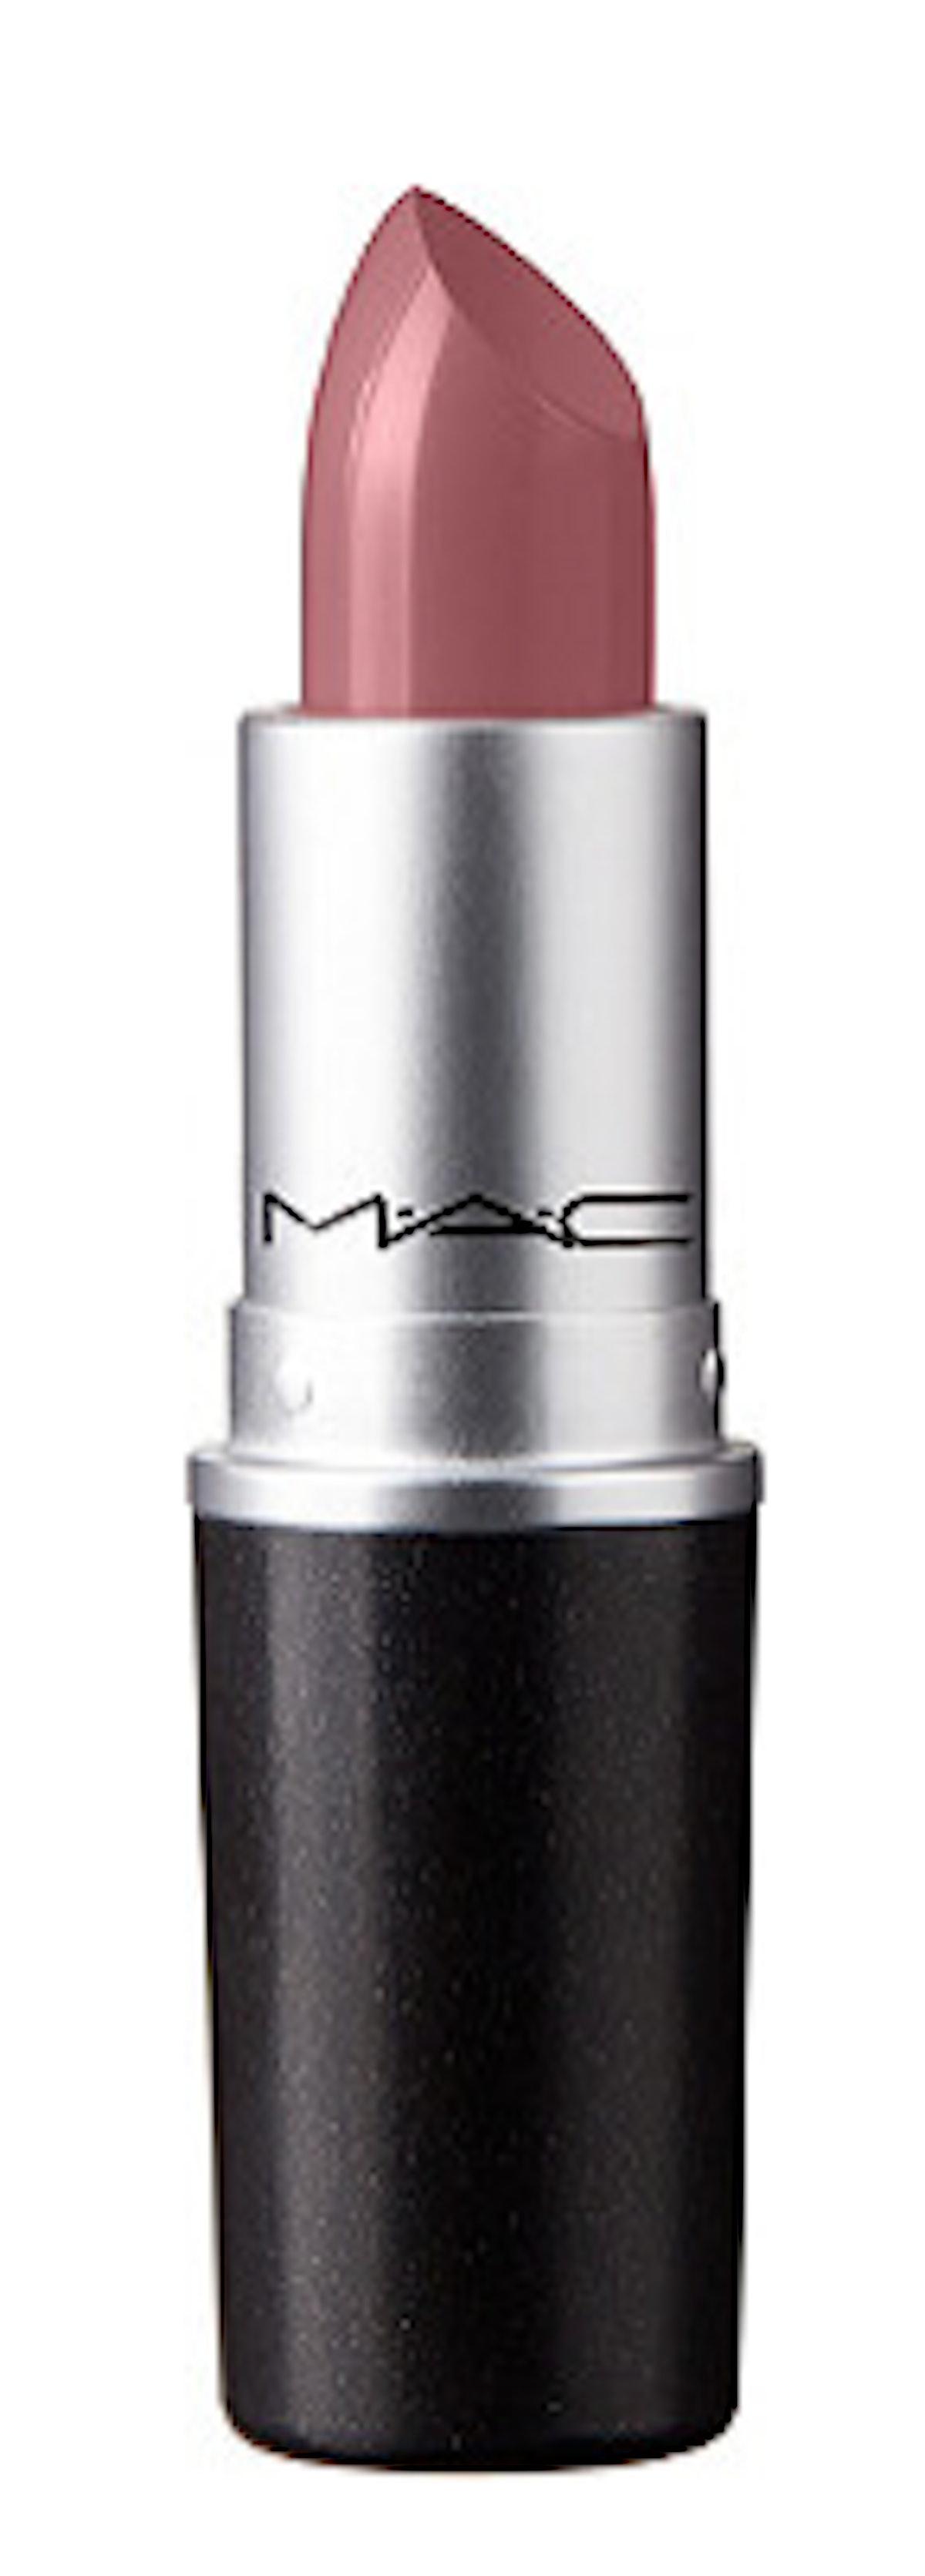 MAC Lipstick in Diva and Cream In Your Coffee